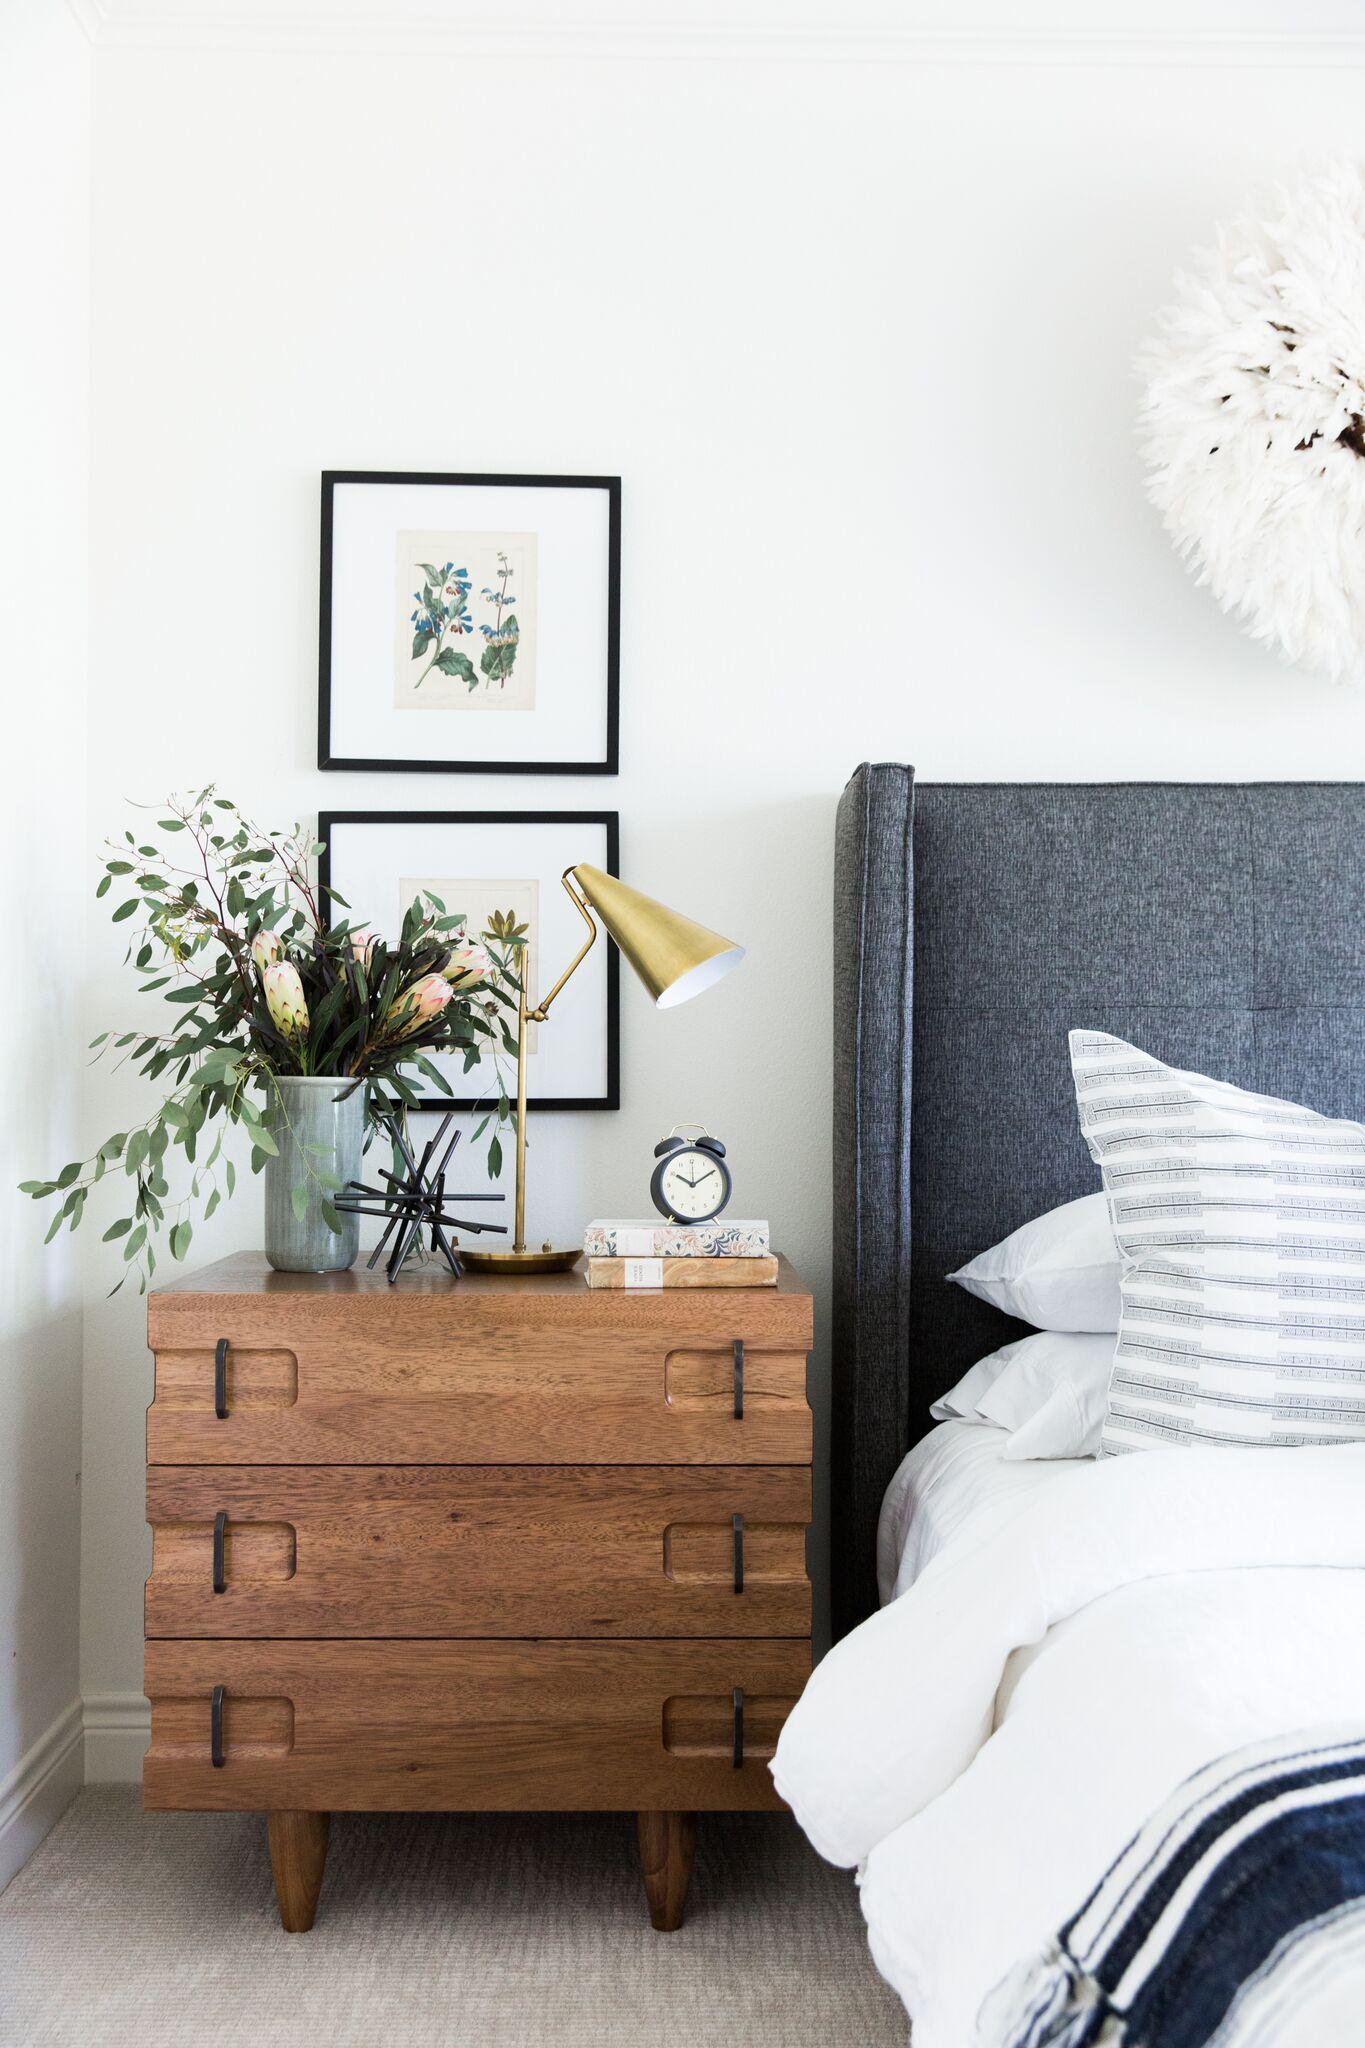 2Coastal+Bohemian+Guest+Bedroom+with+Vintage+Rug+and+Botanical+Prints.jpg